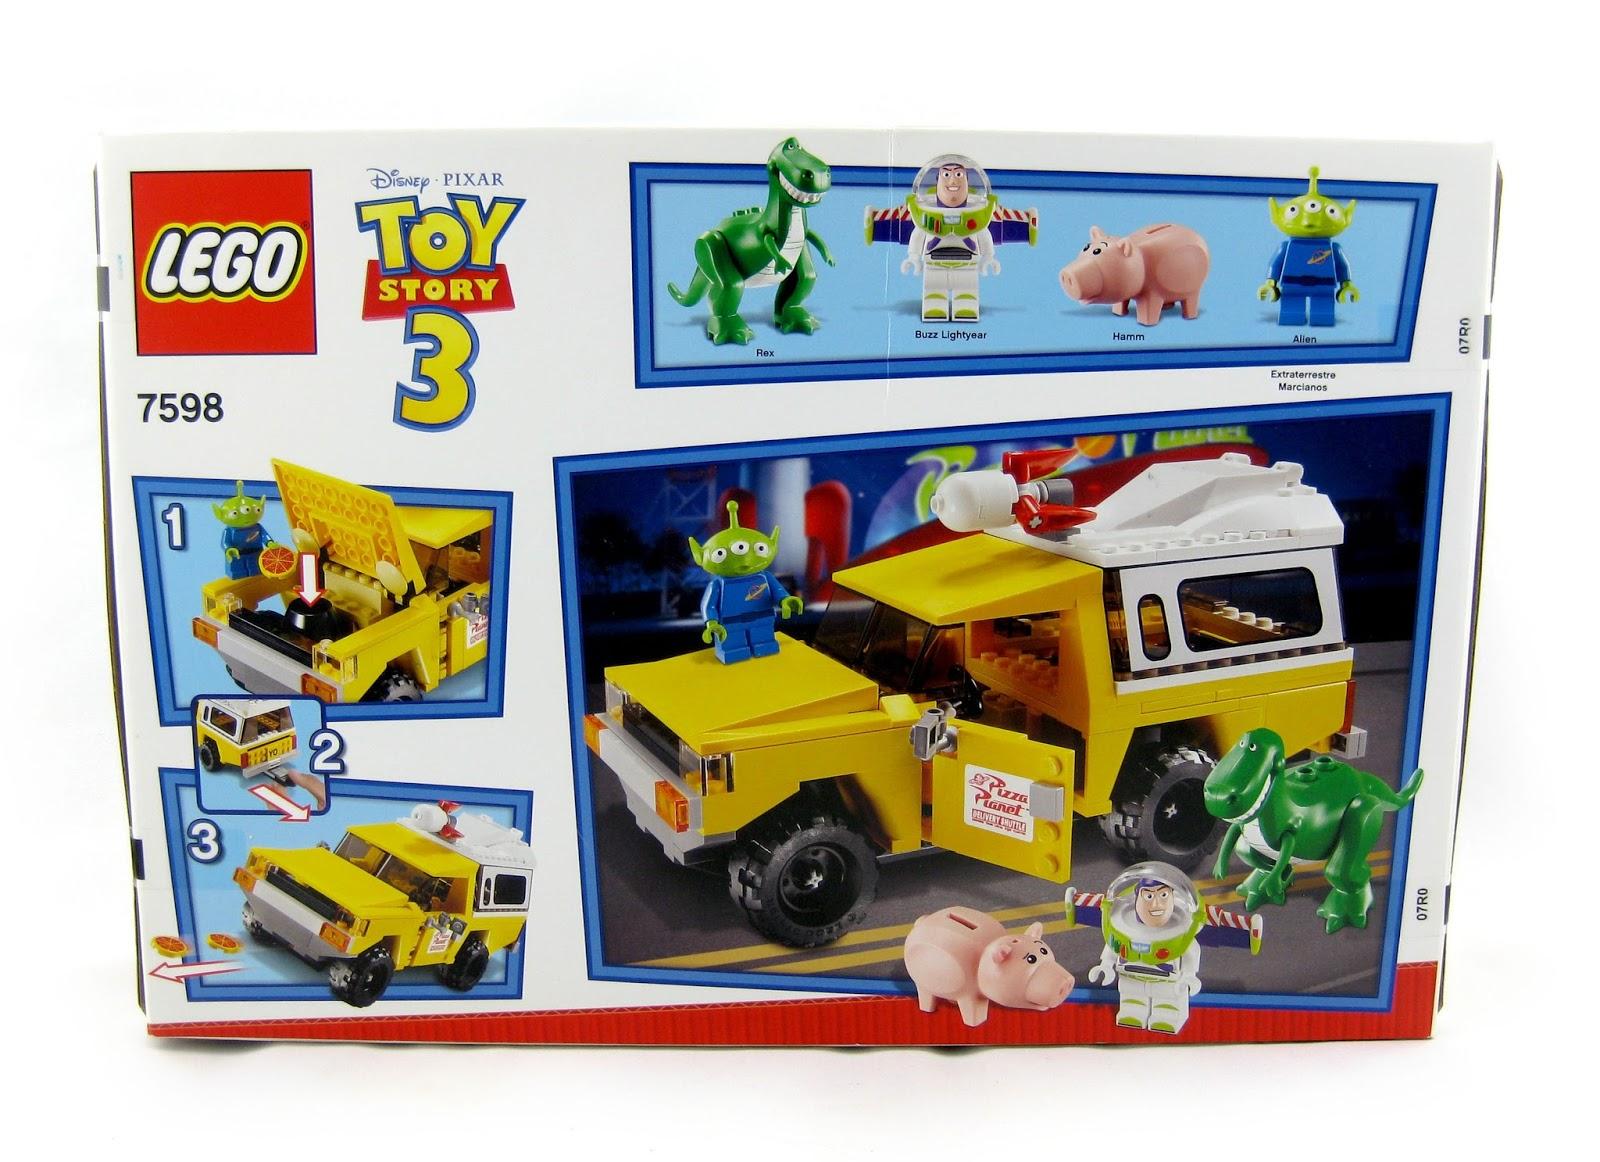 Dan The Pixar Fan Toy Story 2 Lego Pizza Planet Truck